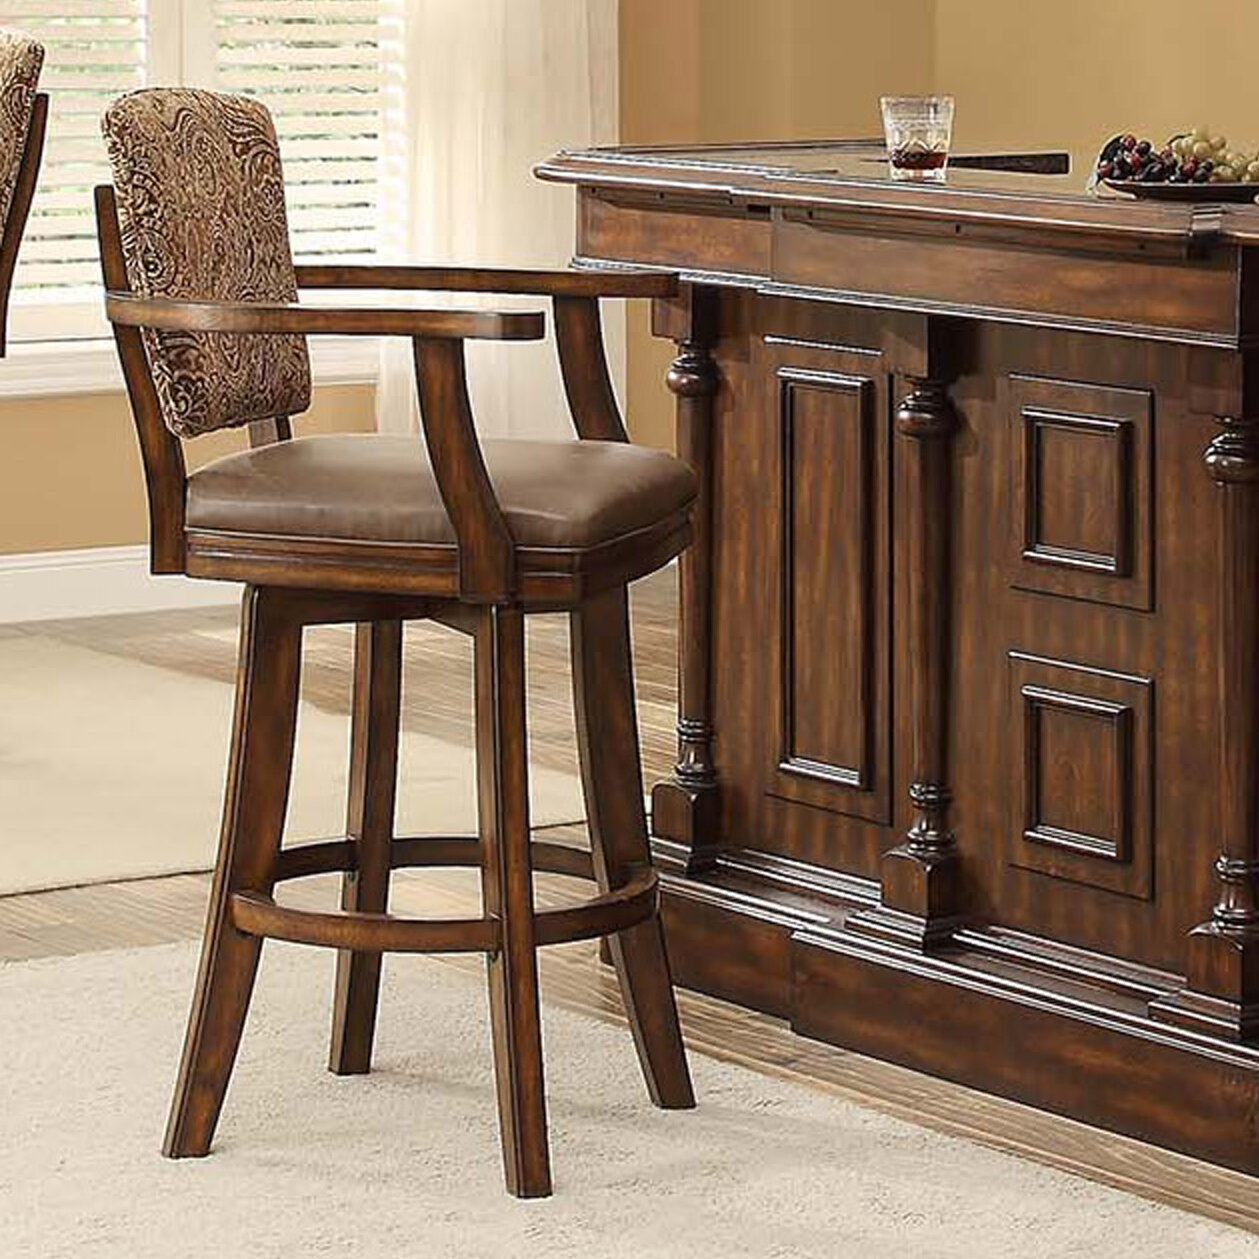 ECI Furniture Trafalgar 307quot Swivel Bar Stool eBay : 1 from www.ebay.com size 1259 x 1259 jpeg 398kB